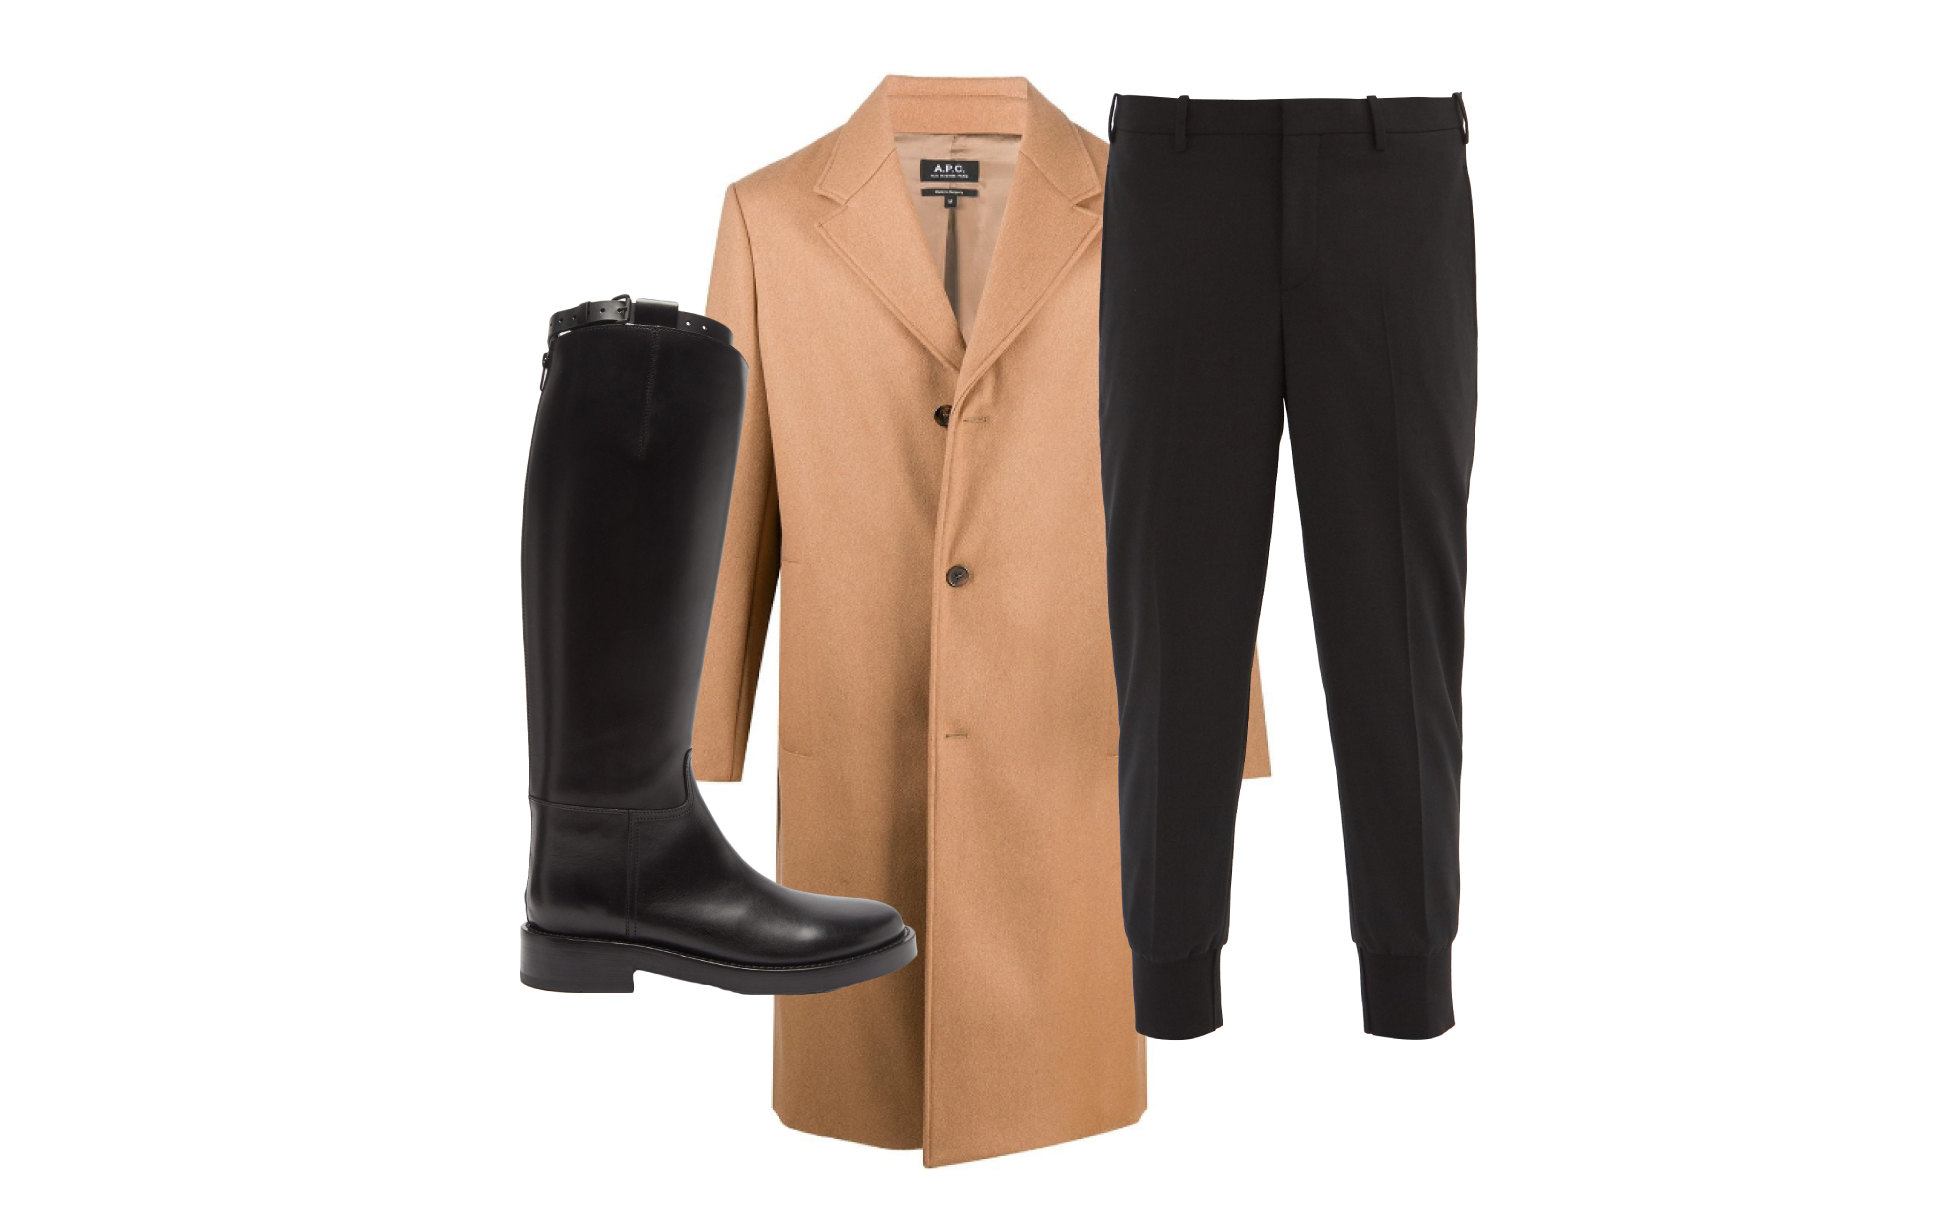 Пальто A.P.C., 38 453 руб. ; брюки Neil Barrett, €296; сапоги Ann Demeuleester, €961